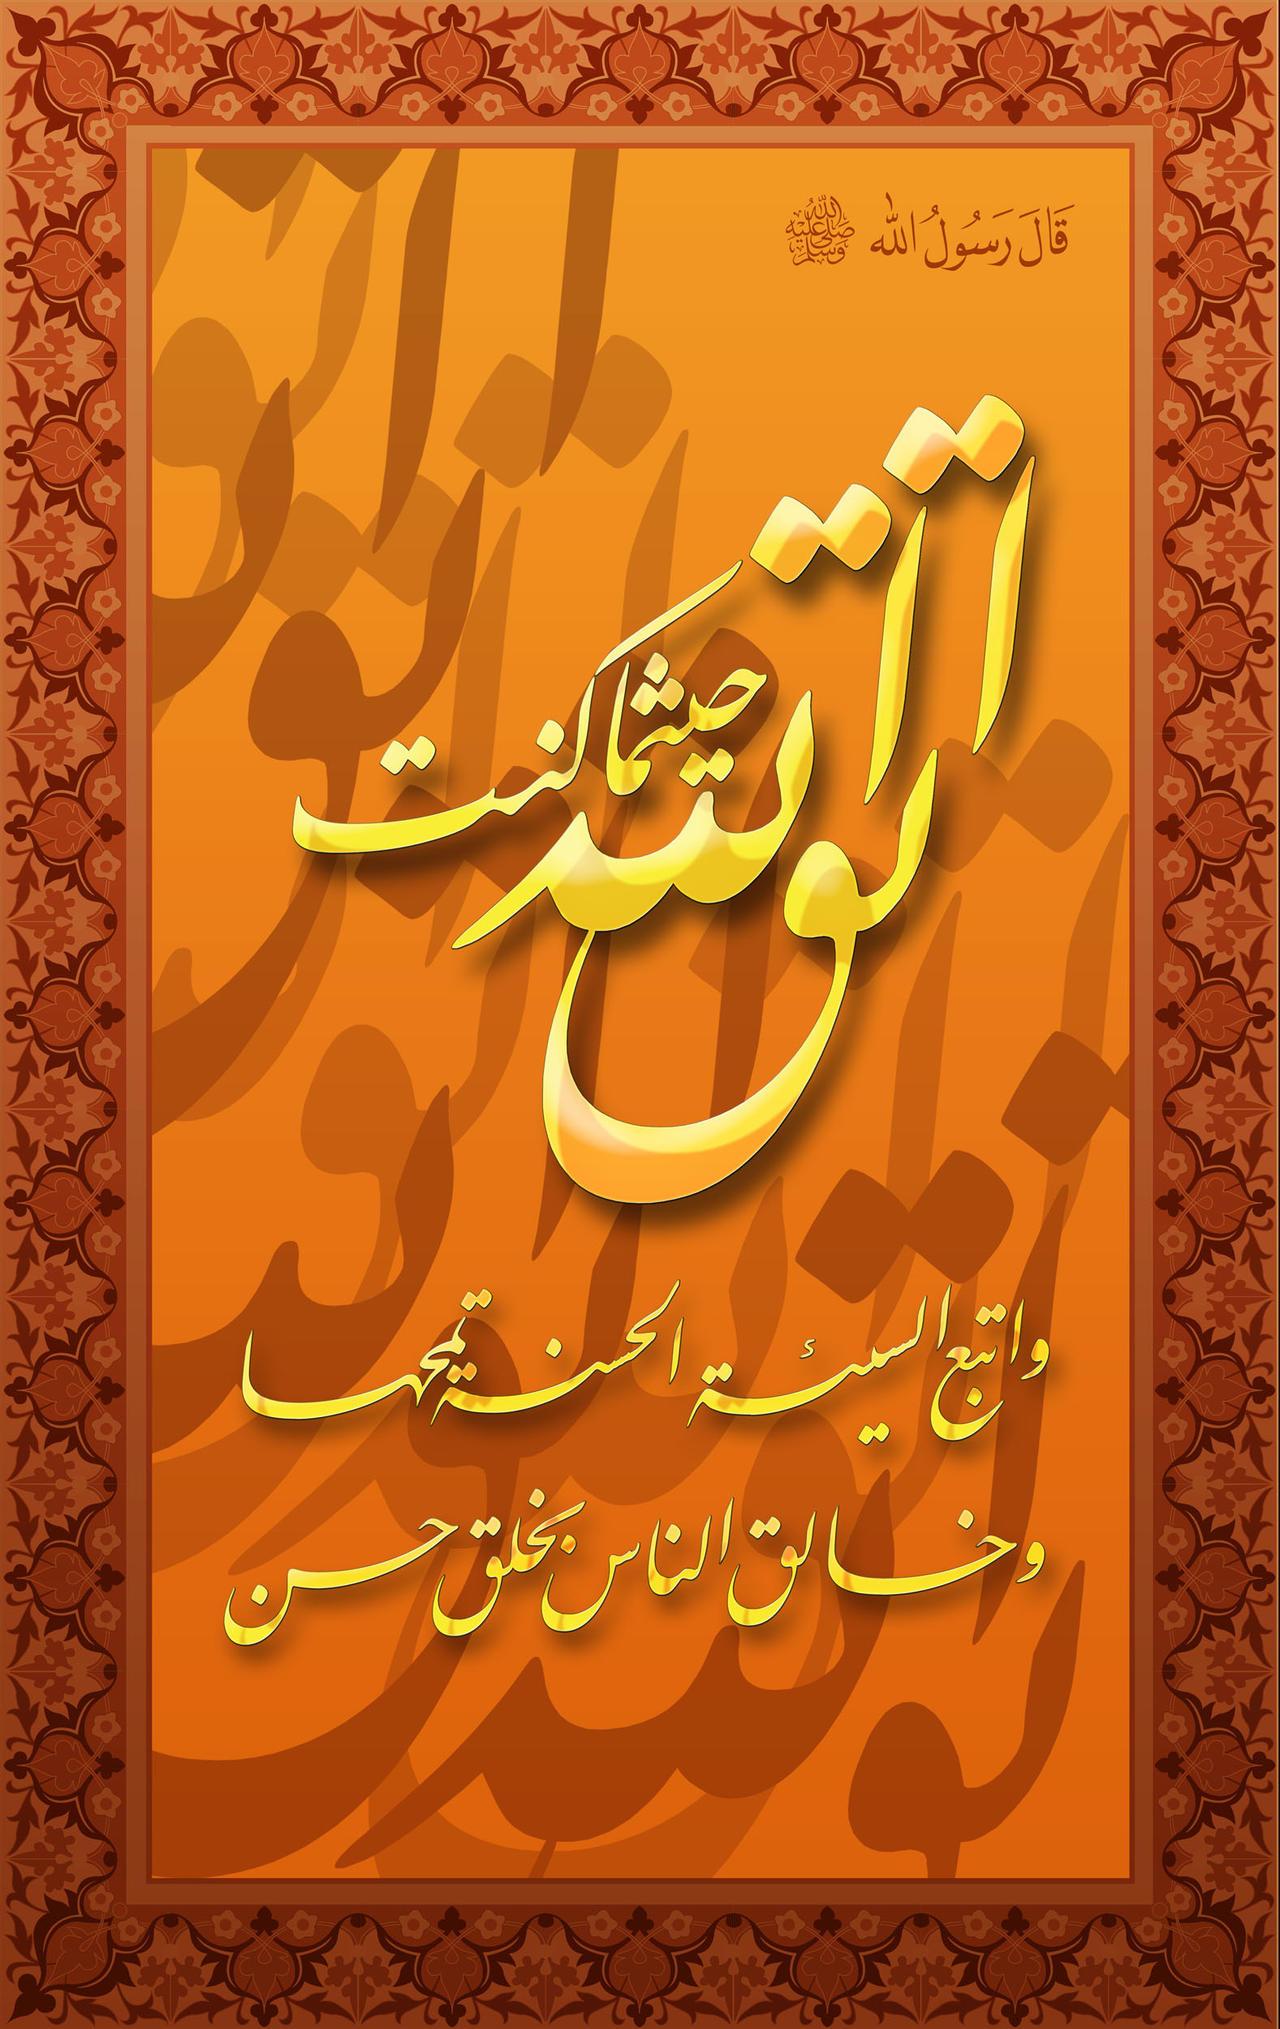 Prophet's anniversary Hadith 01 by Nayzak